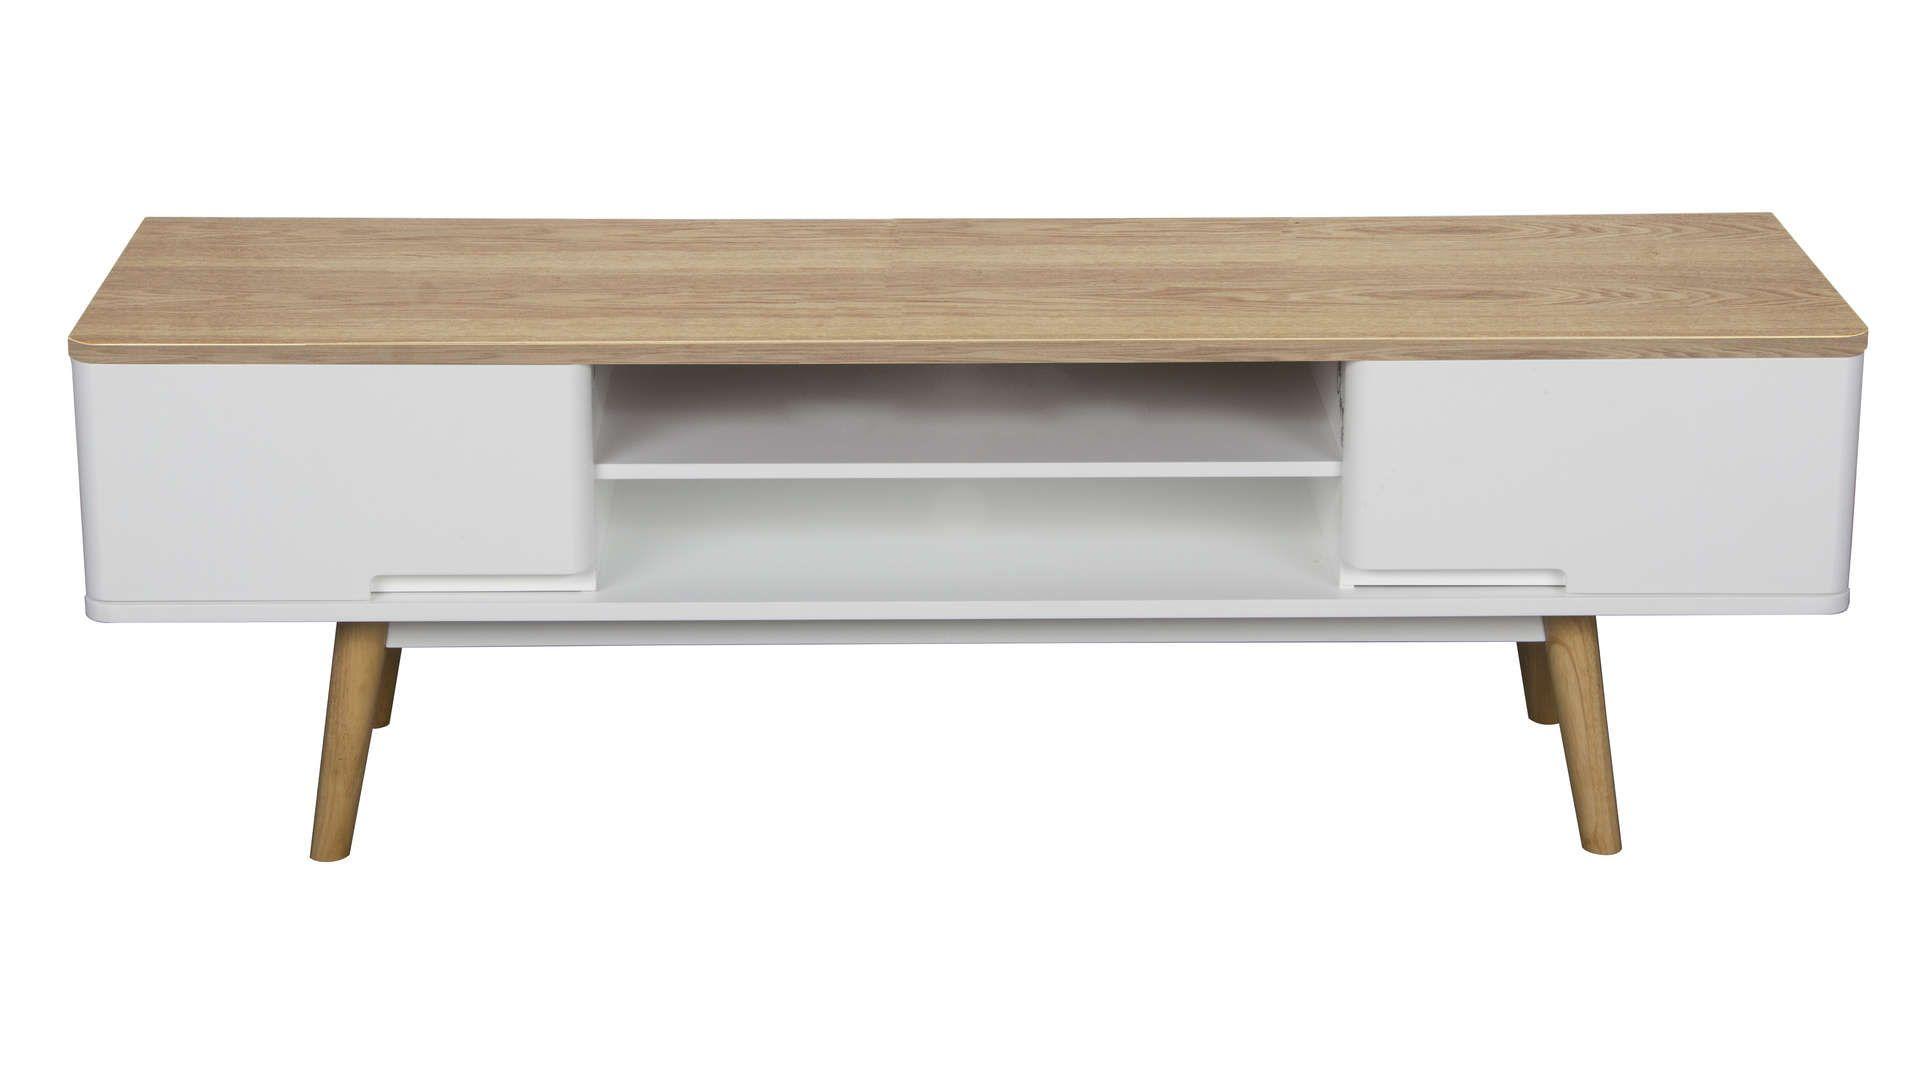 Meuble Tv Winsley Coloris Blanc Frene Vente De Meuble Tv Conforama Meuble Tv Meuble Tv Conforama Deco Maison